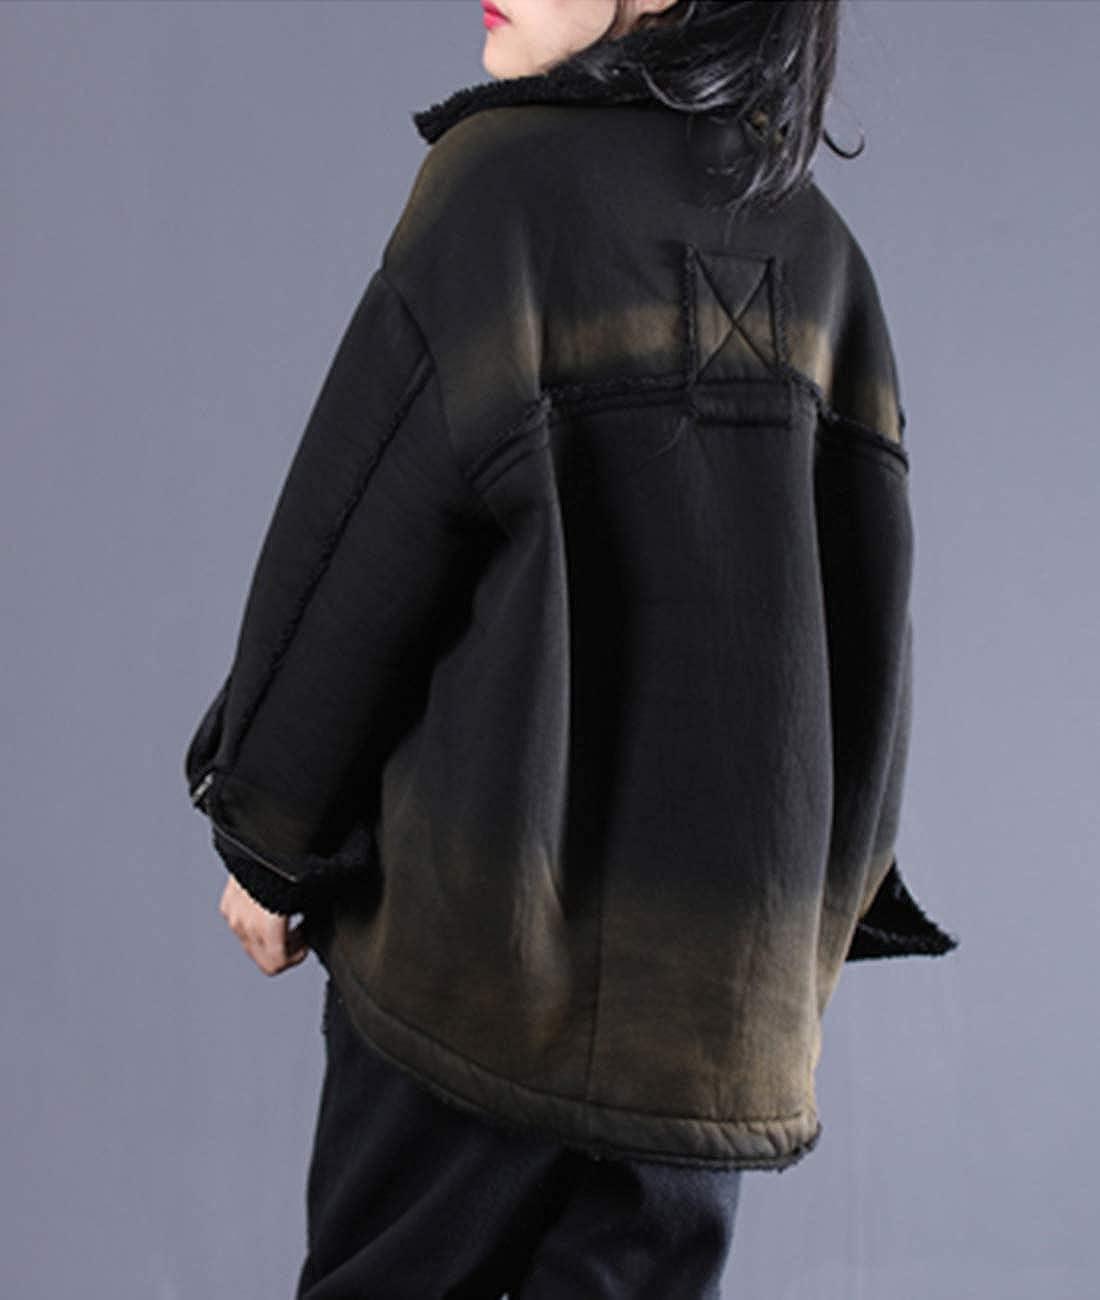 YESNO WS2 Women Casual Loose BF Fleece Jacket Fashion Warm Outerwear Full Zip Distressed//Pocket